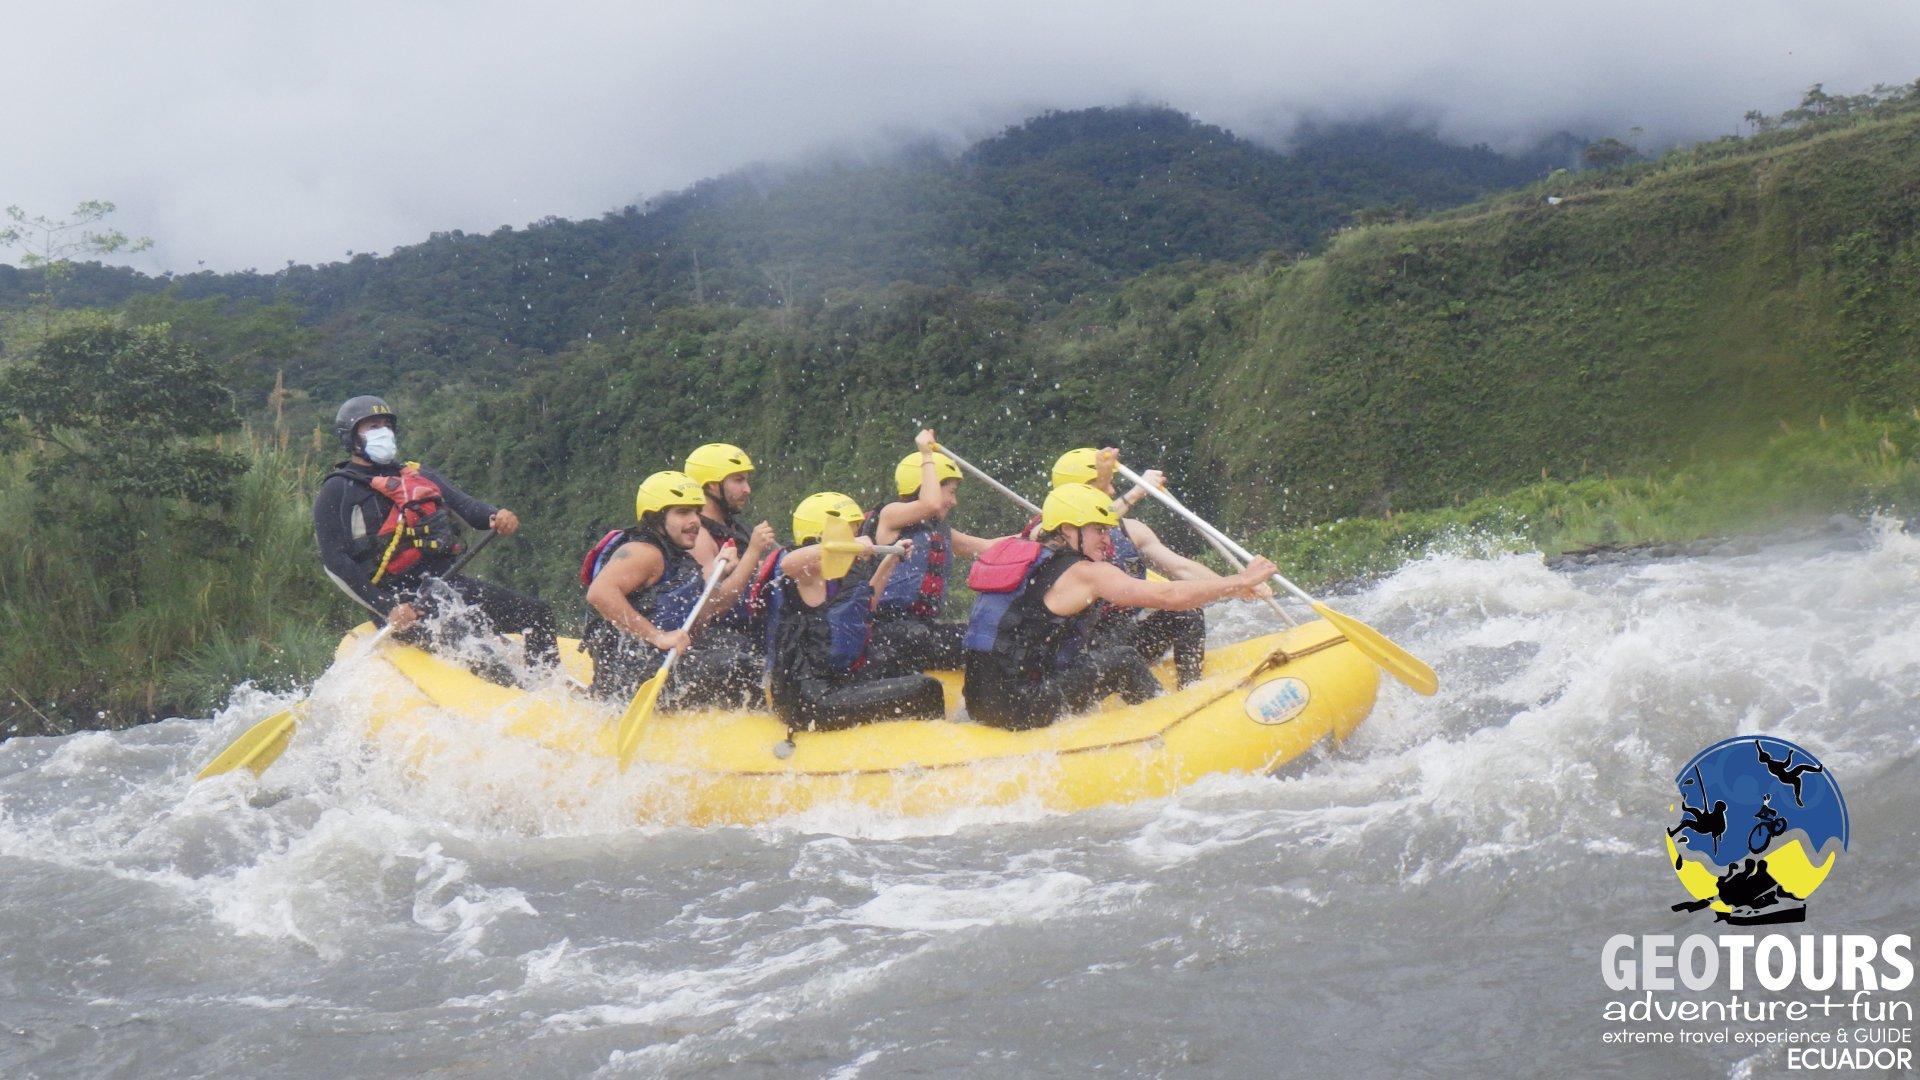 Foto Biosecurity measures for tourism in Baños de Agua Santa